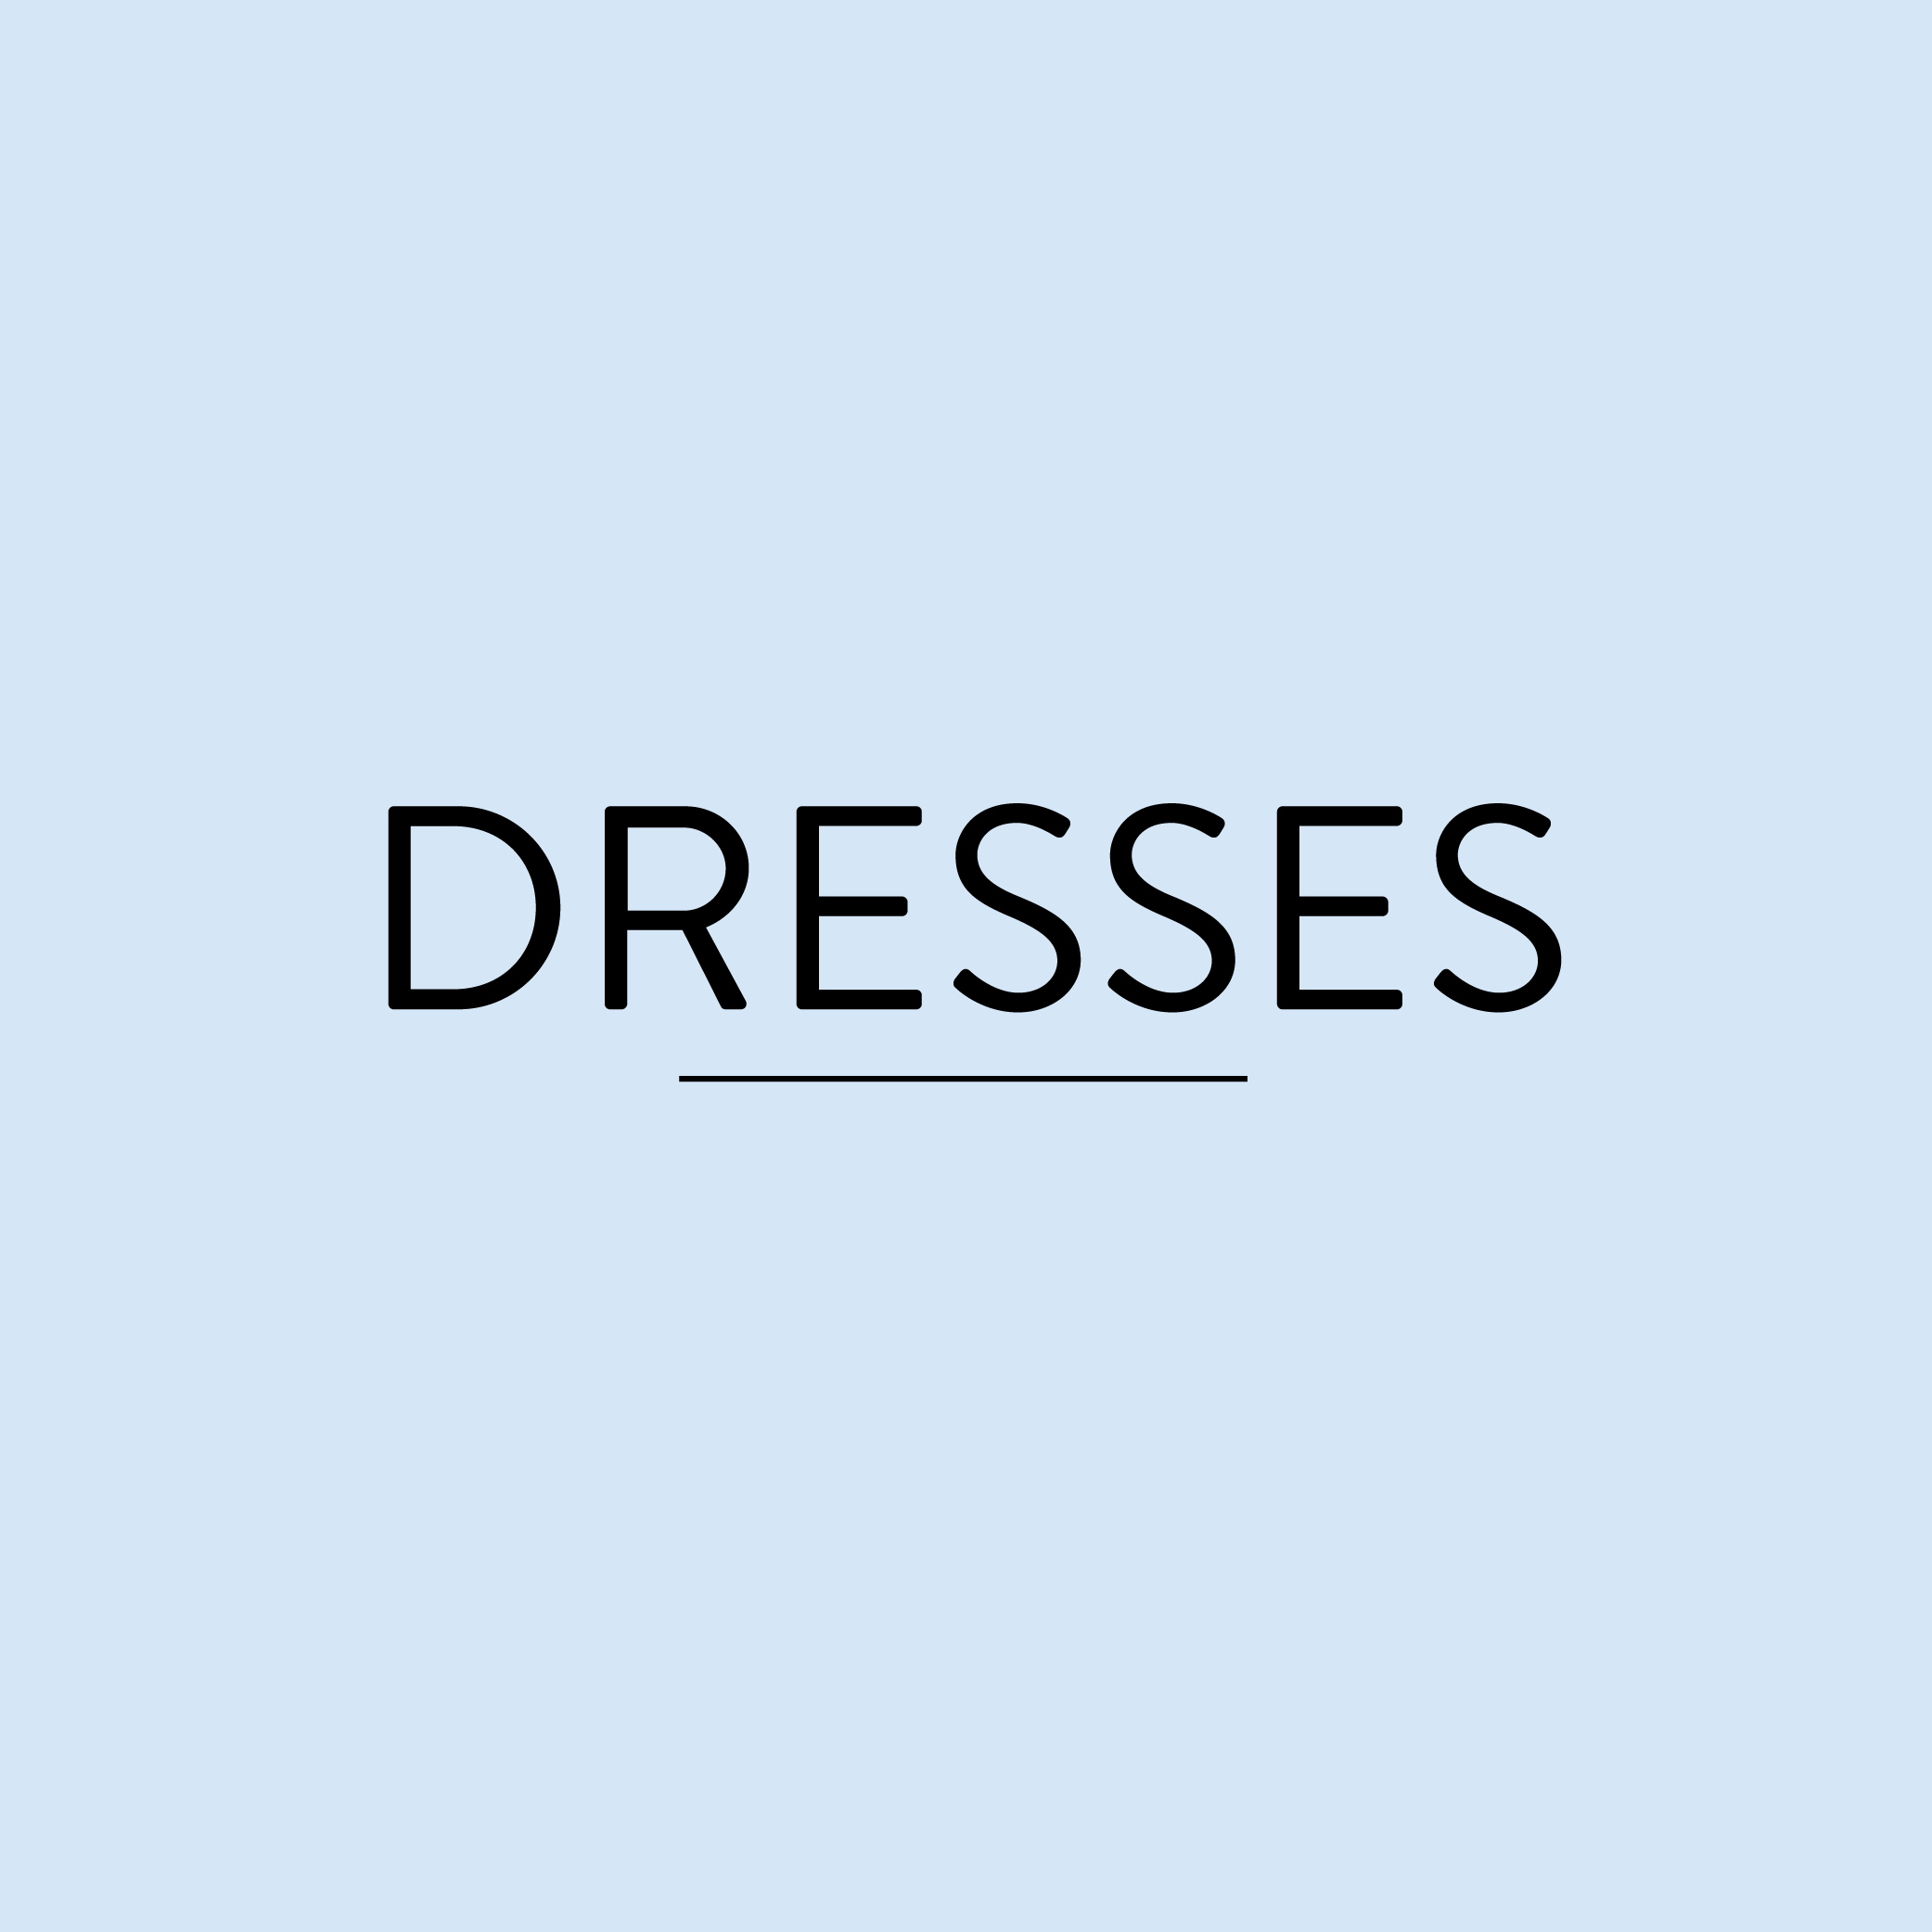 figjam_Dresses.png